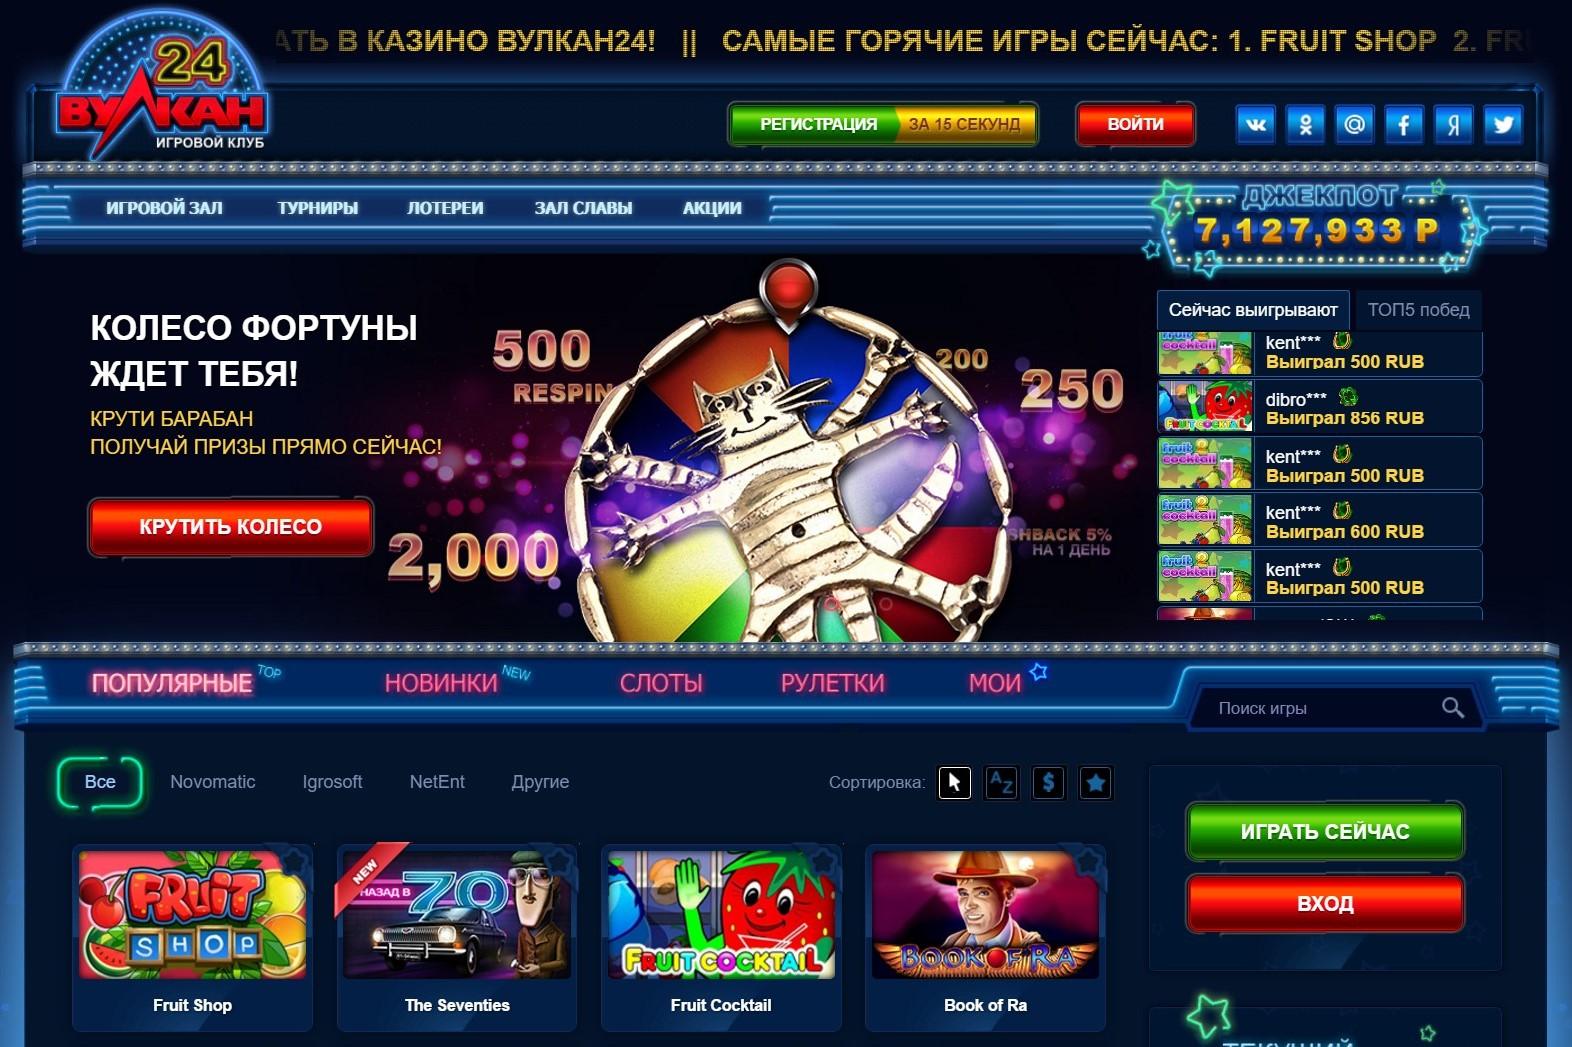 играть онлайн в казино vulkan24